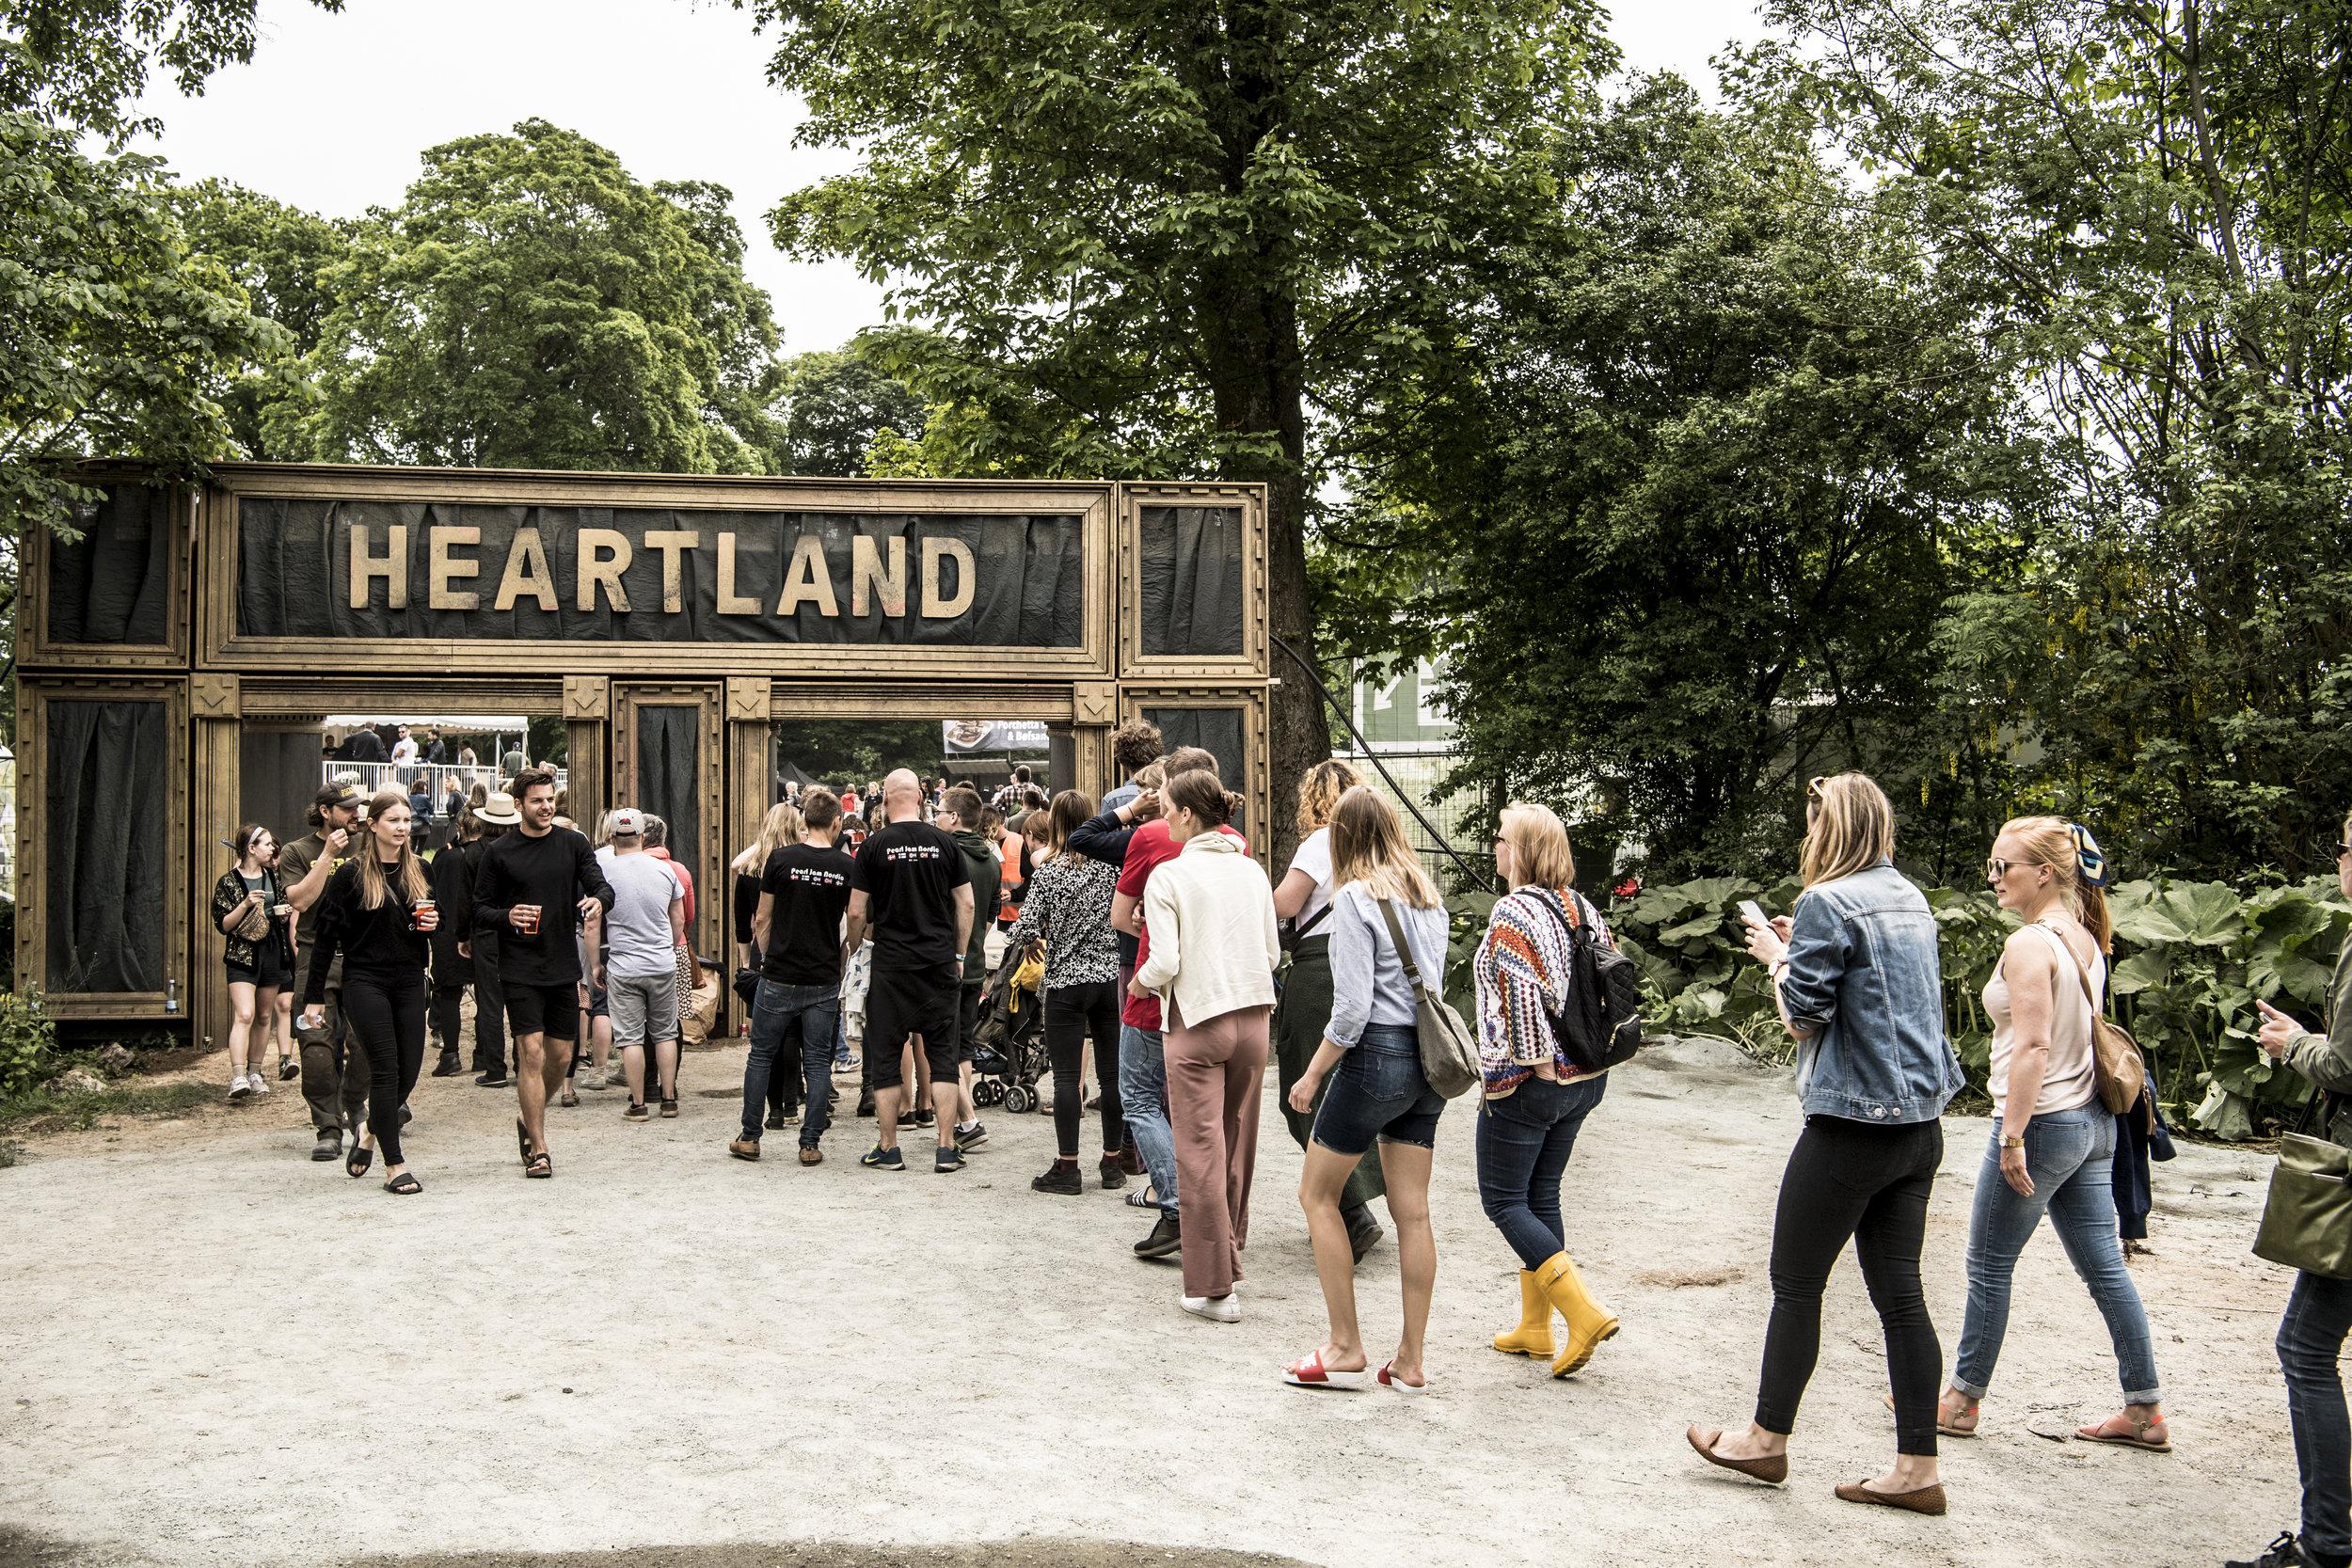 Heartland Festival, 2017. Photo by Morten Rygaard.